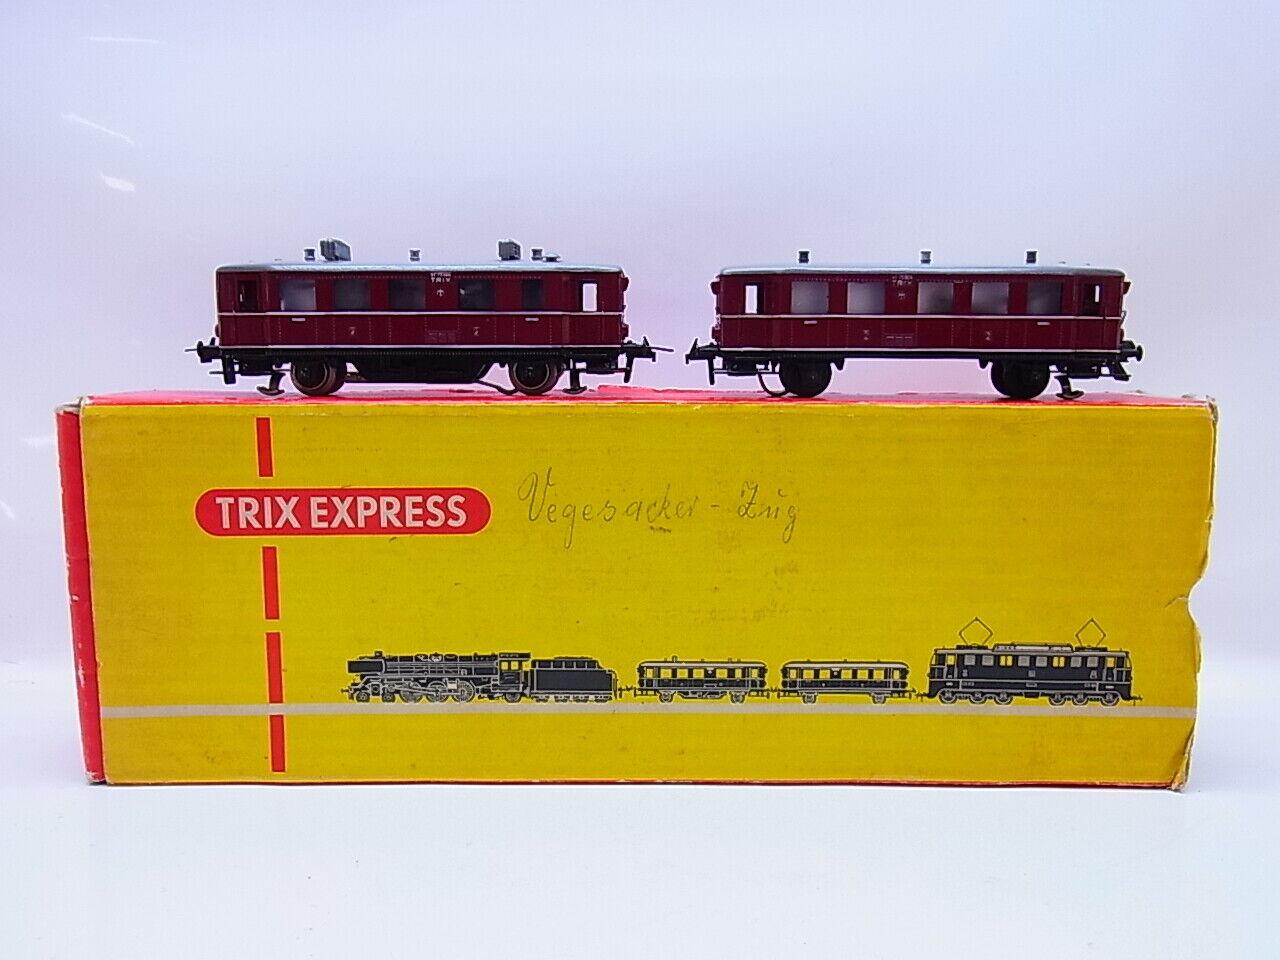 58323   Trix Express H0 32270 Railbus VT75 with Trailer BNIB